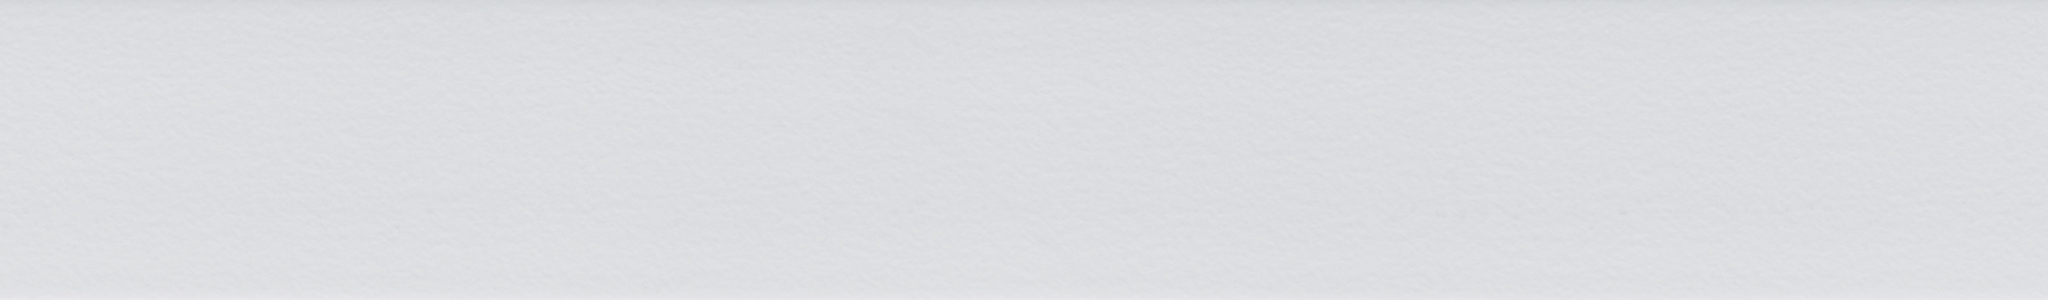 HU 157501 ABS Kante UNI Violett feinperl 107